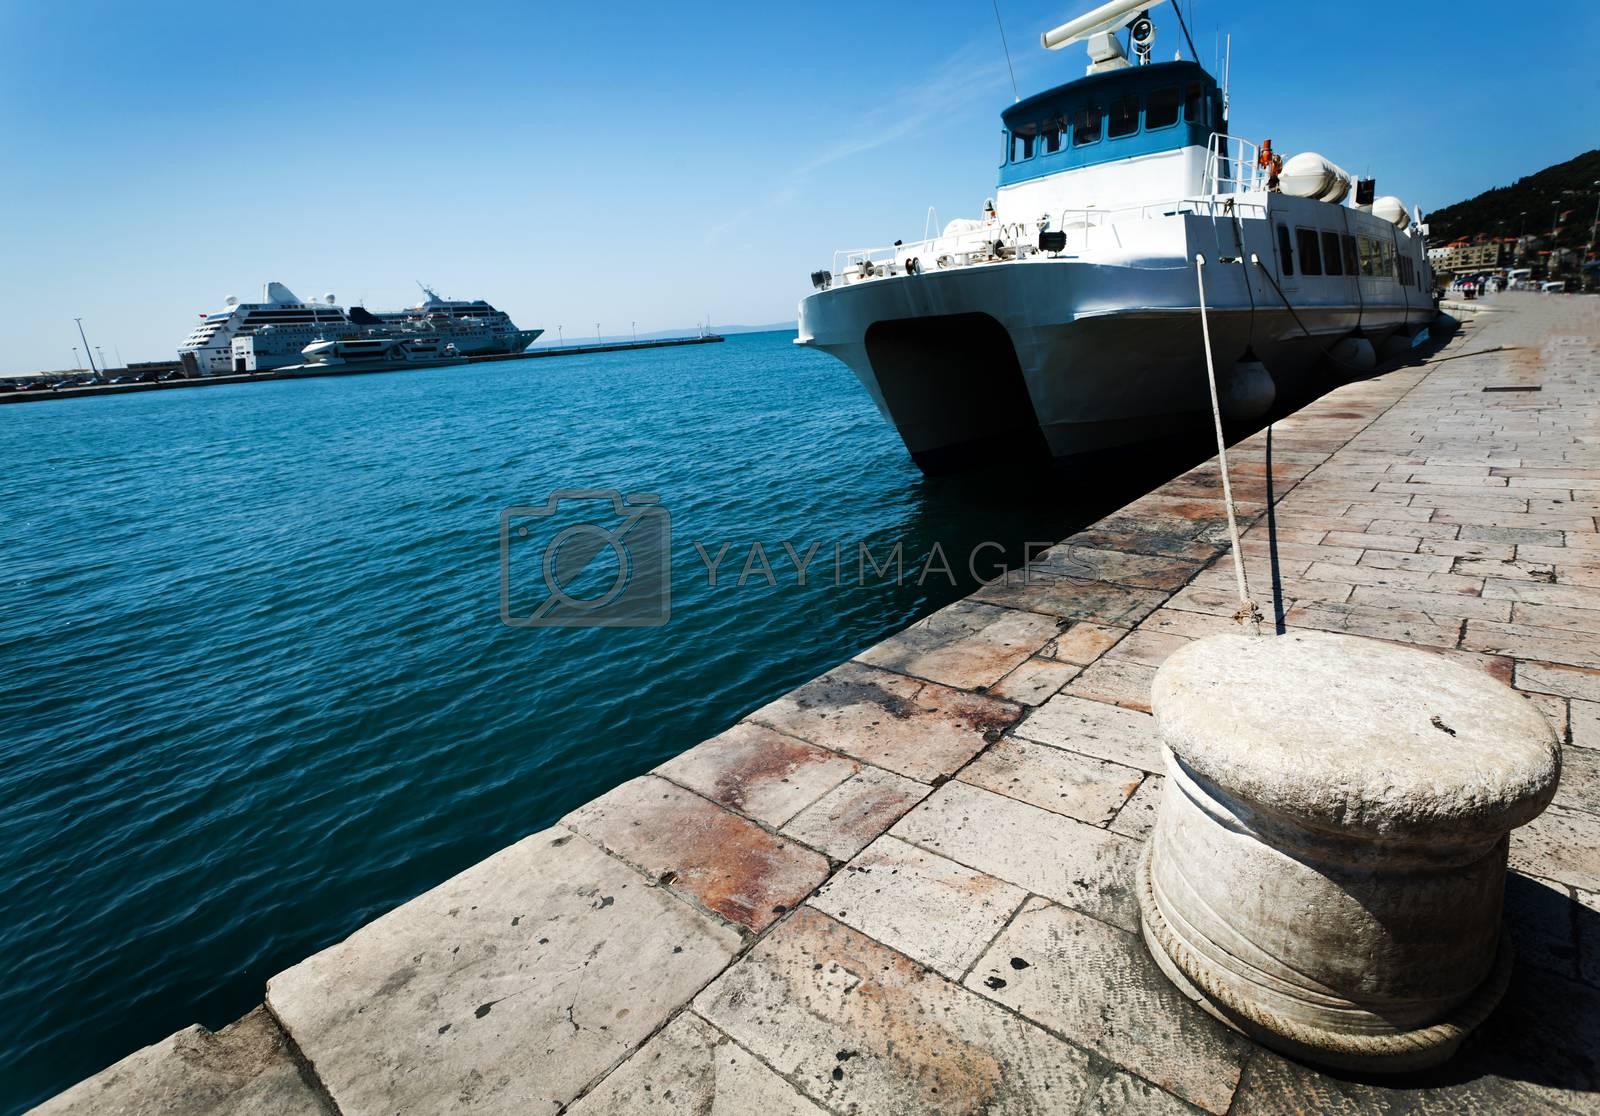 Croatia - big ferryboat anchored in a harbor Split.